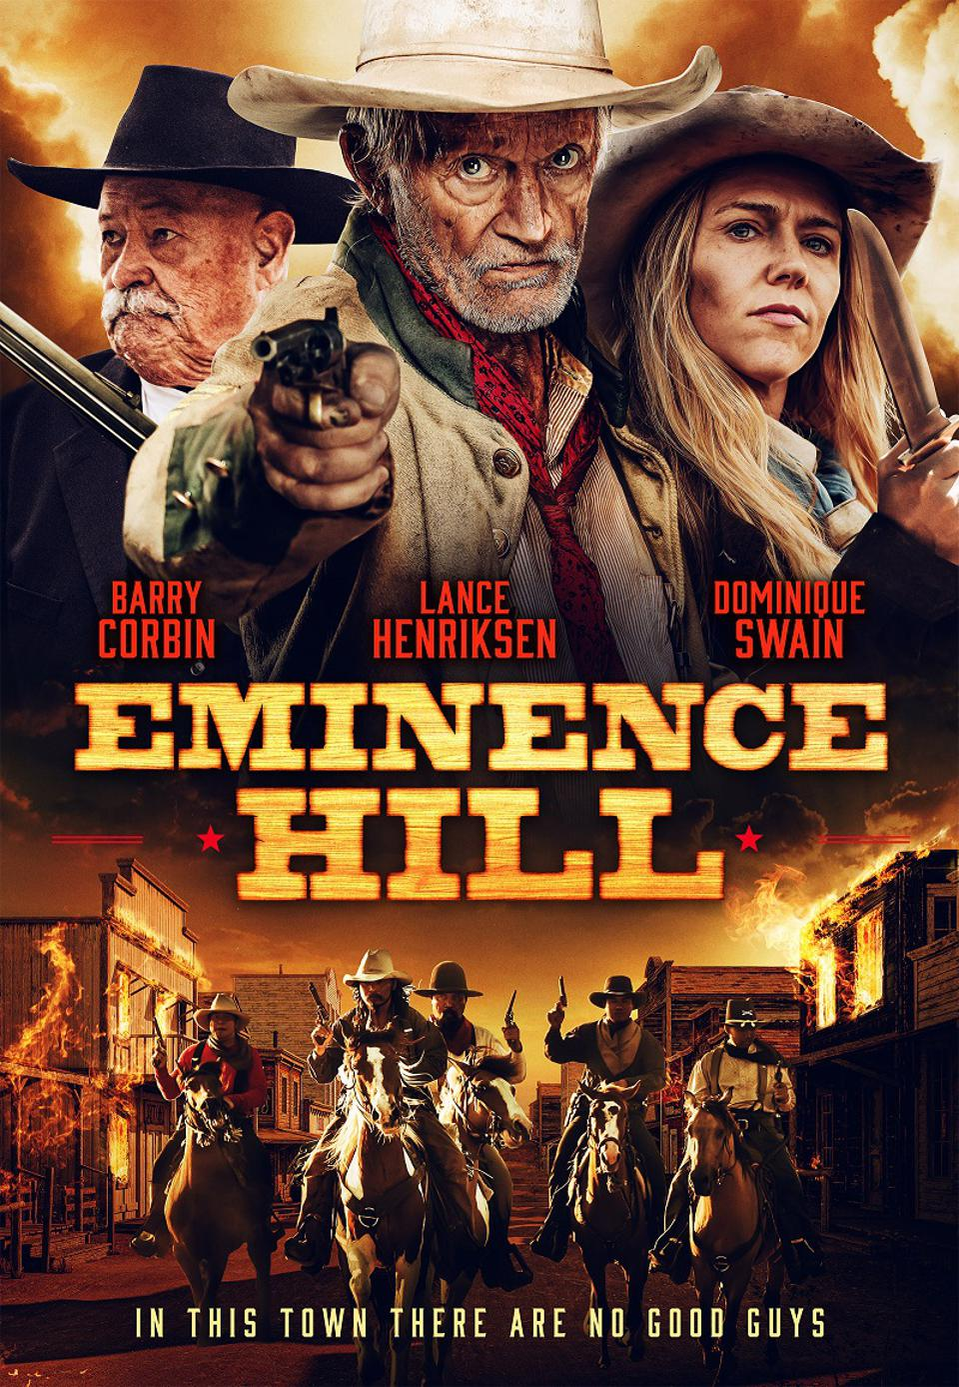 Eminence Hill Lance Henriksen